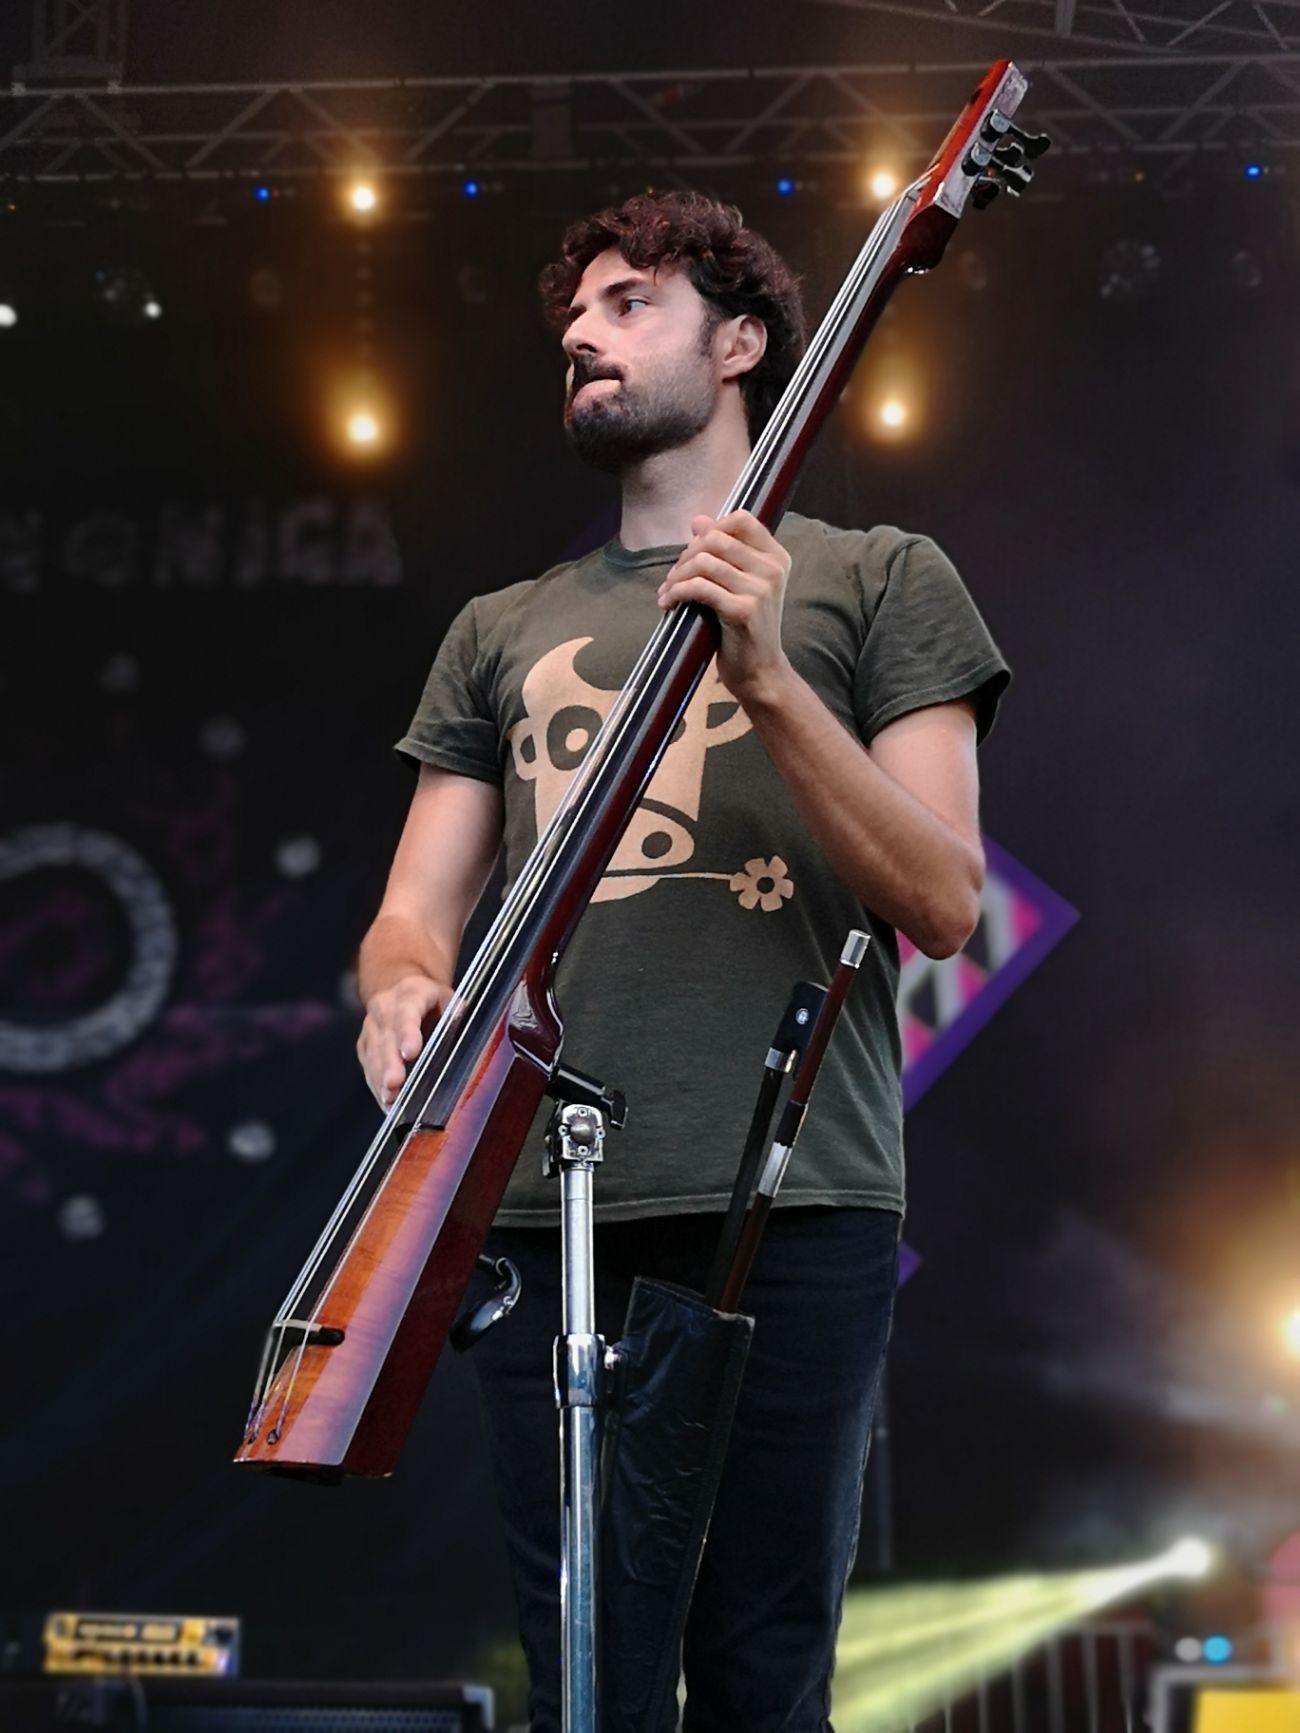 Baro Drom Orkestar pannonica 2019